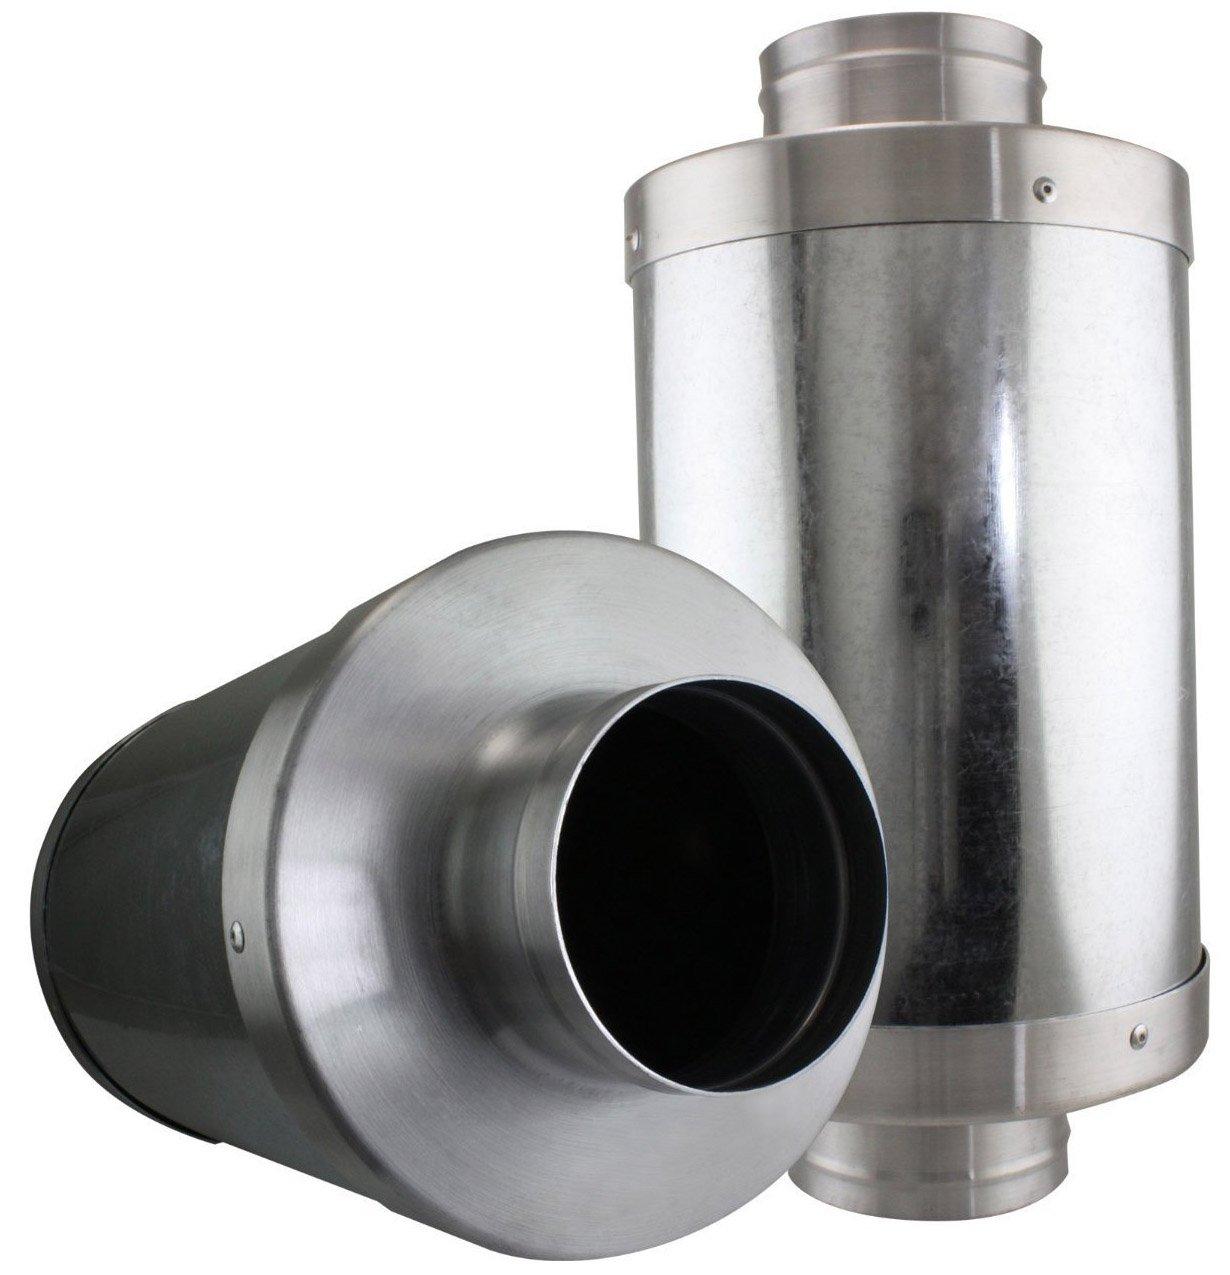 VenTech VT FS-6 FS6 Muffler Noise Reducer Silencer System for Inline Duct Fan, 6''